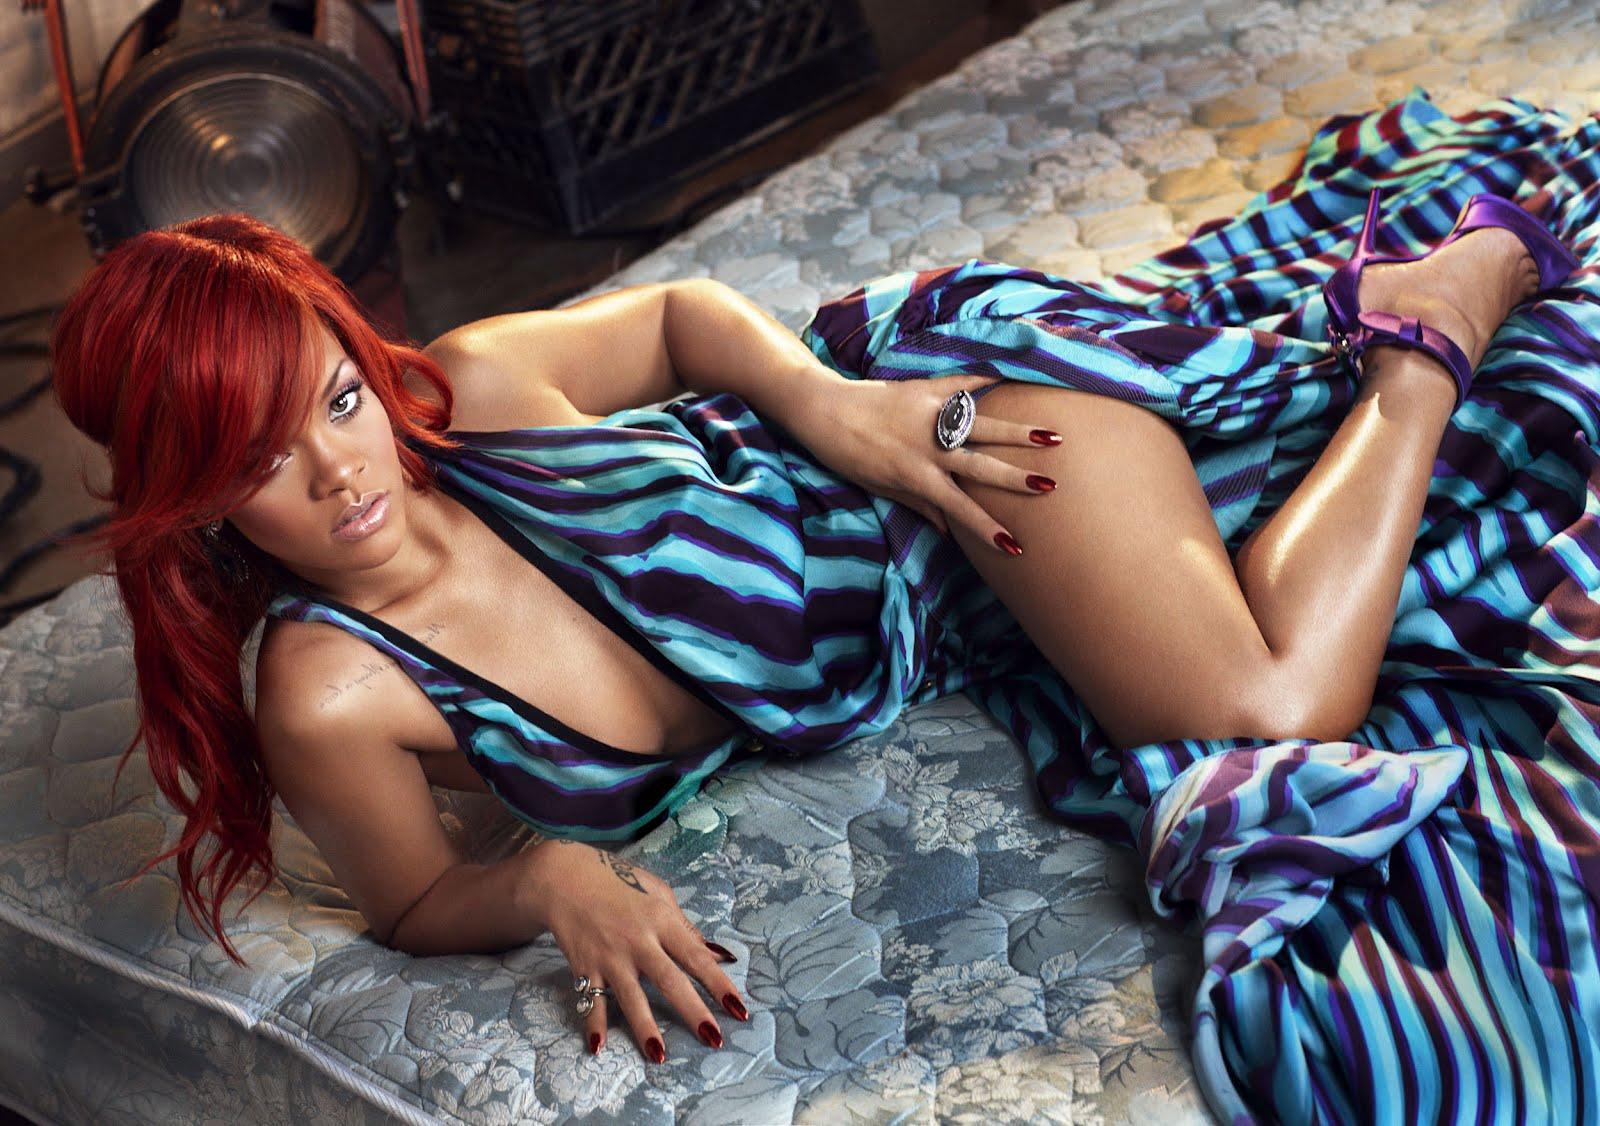 Rihanna Toes: The Toe Cleavage Blog: Rihanna Week